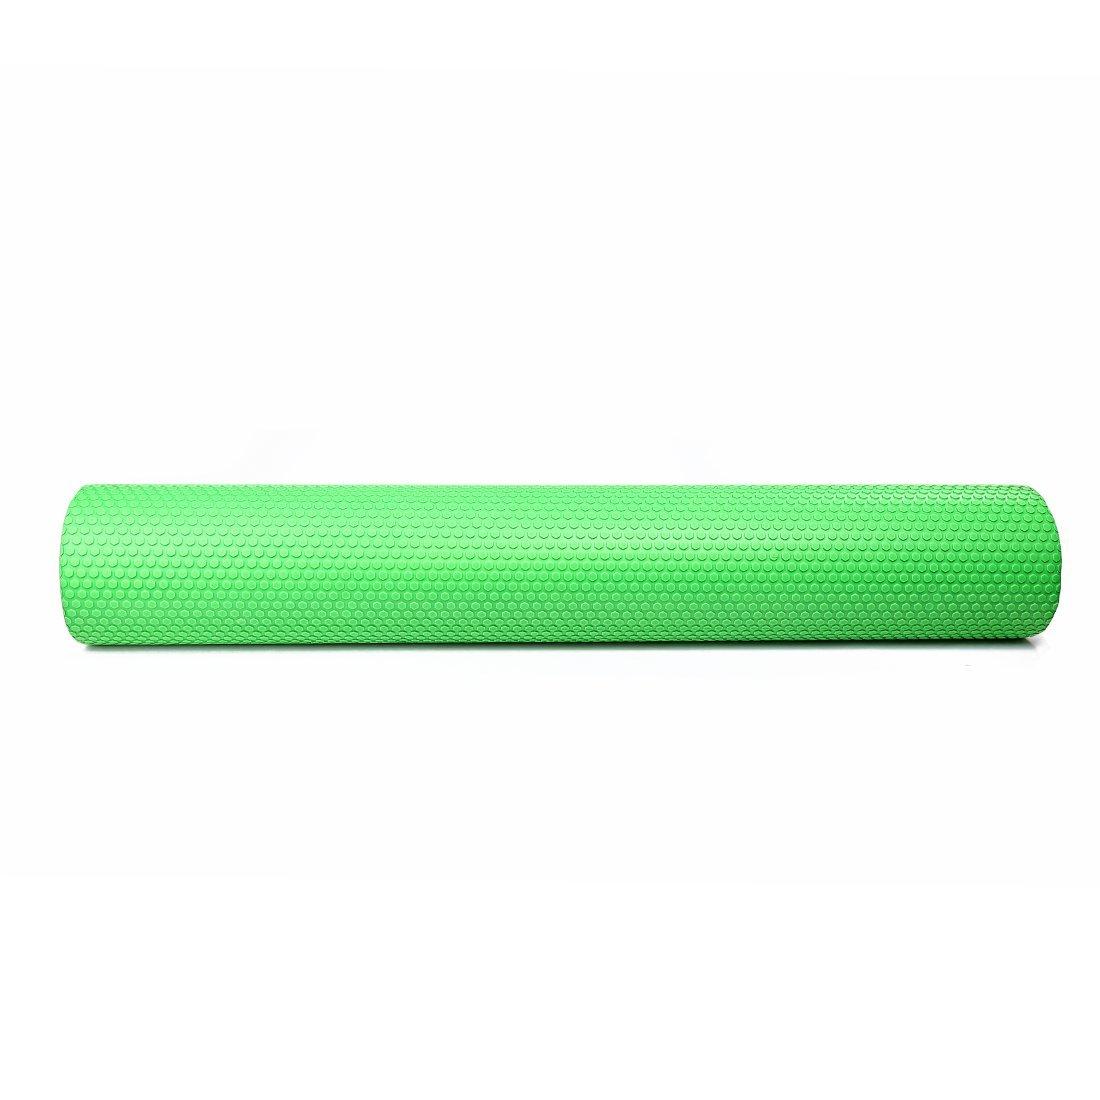 Spinway Yoga Foam Roller